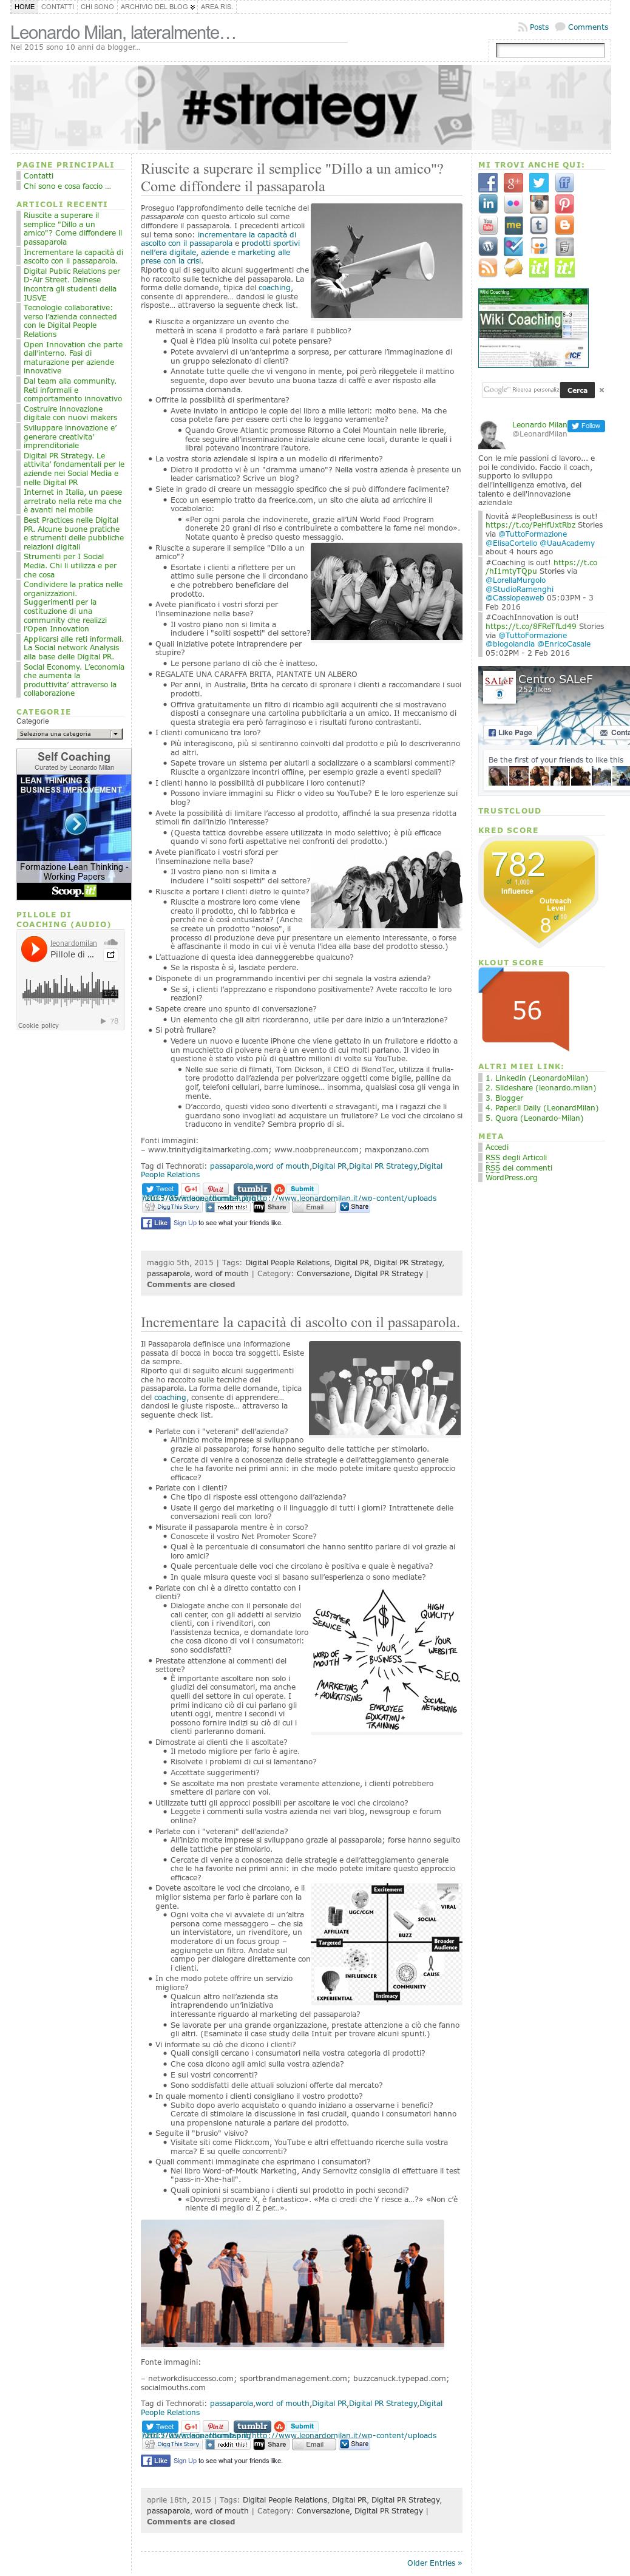 Leonardomilan Competitors, Revenue and Employees - Owler